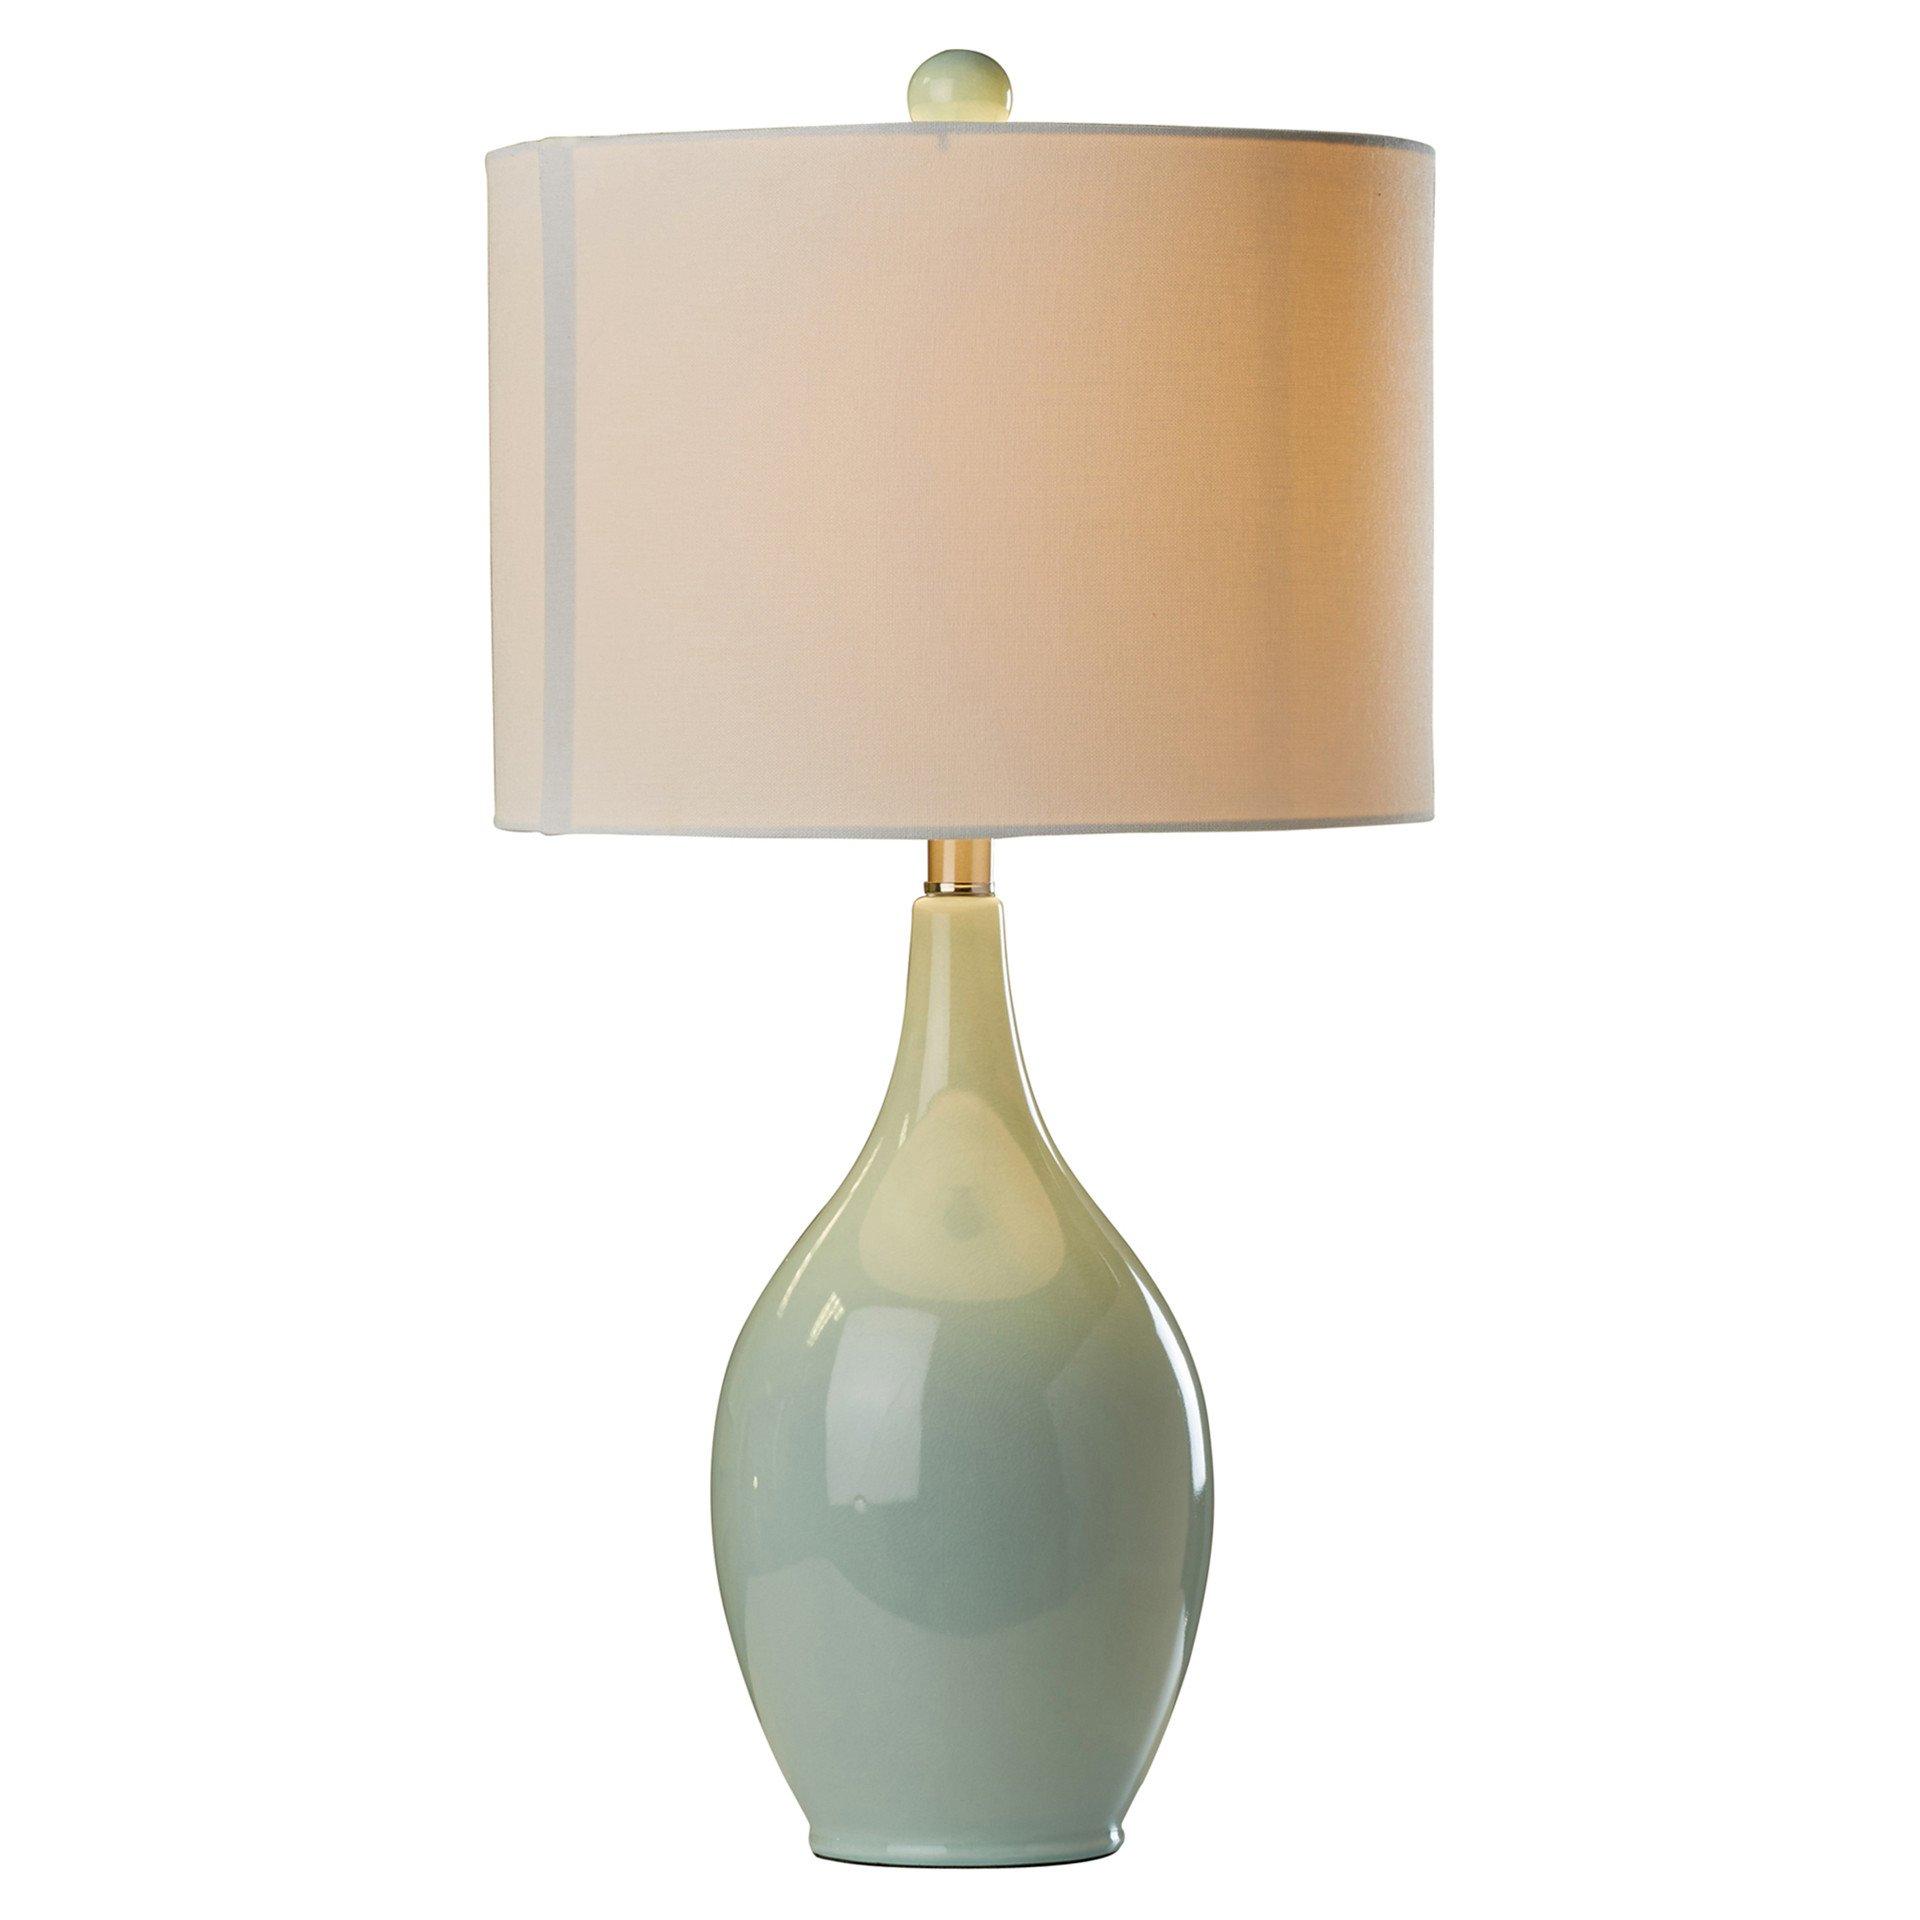 27'' Incandescent Light Bedside Ceramic Table Lamp in Spa Blue